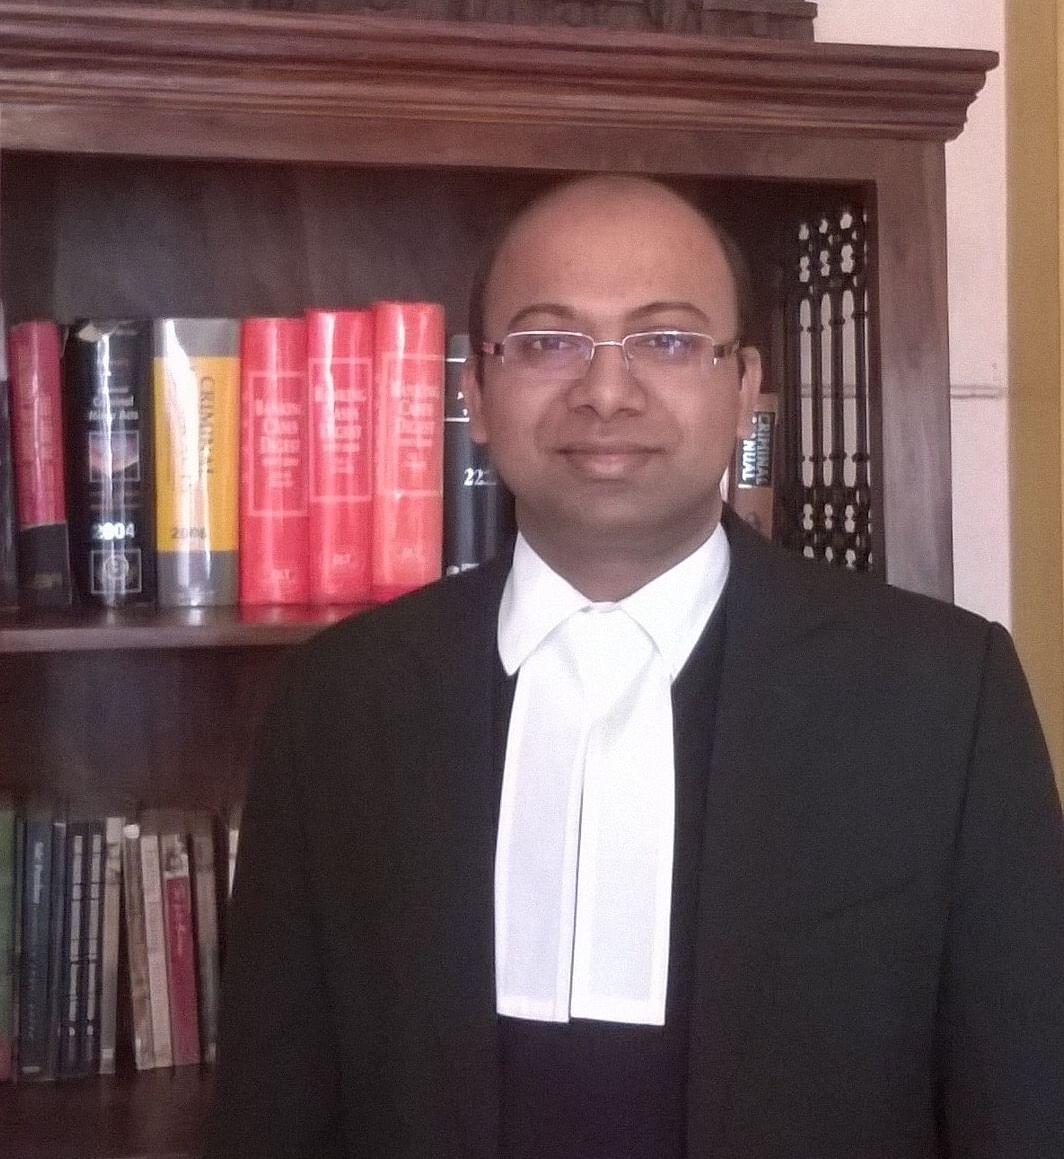 Karanjawala promotes Samarjit Pattnaik to Partnership; Pattnaik becomes second Partner in firm's criminal practice